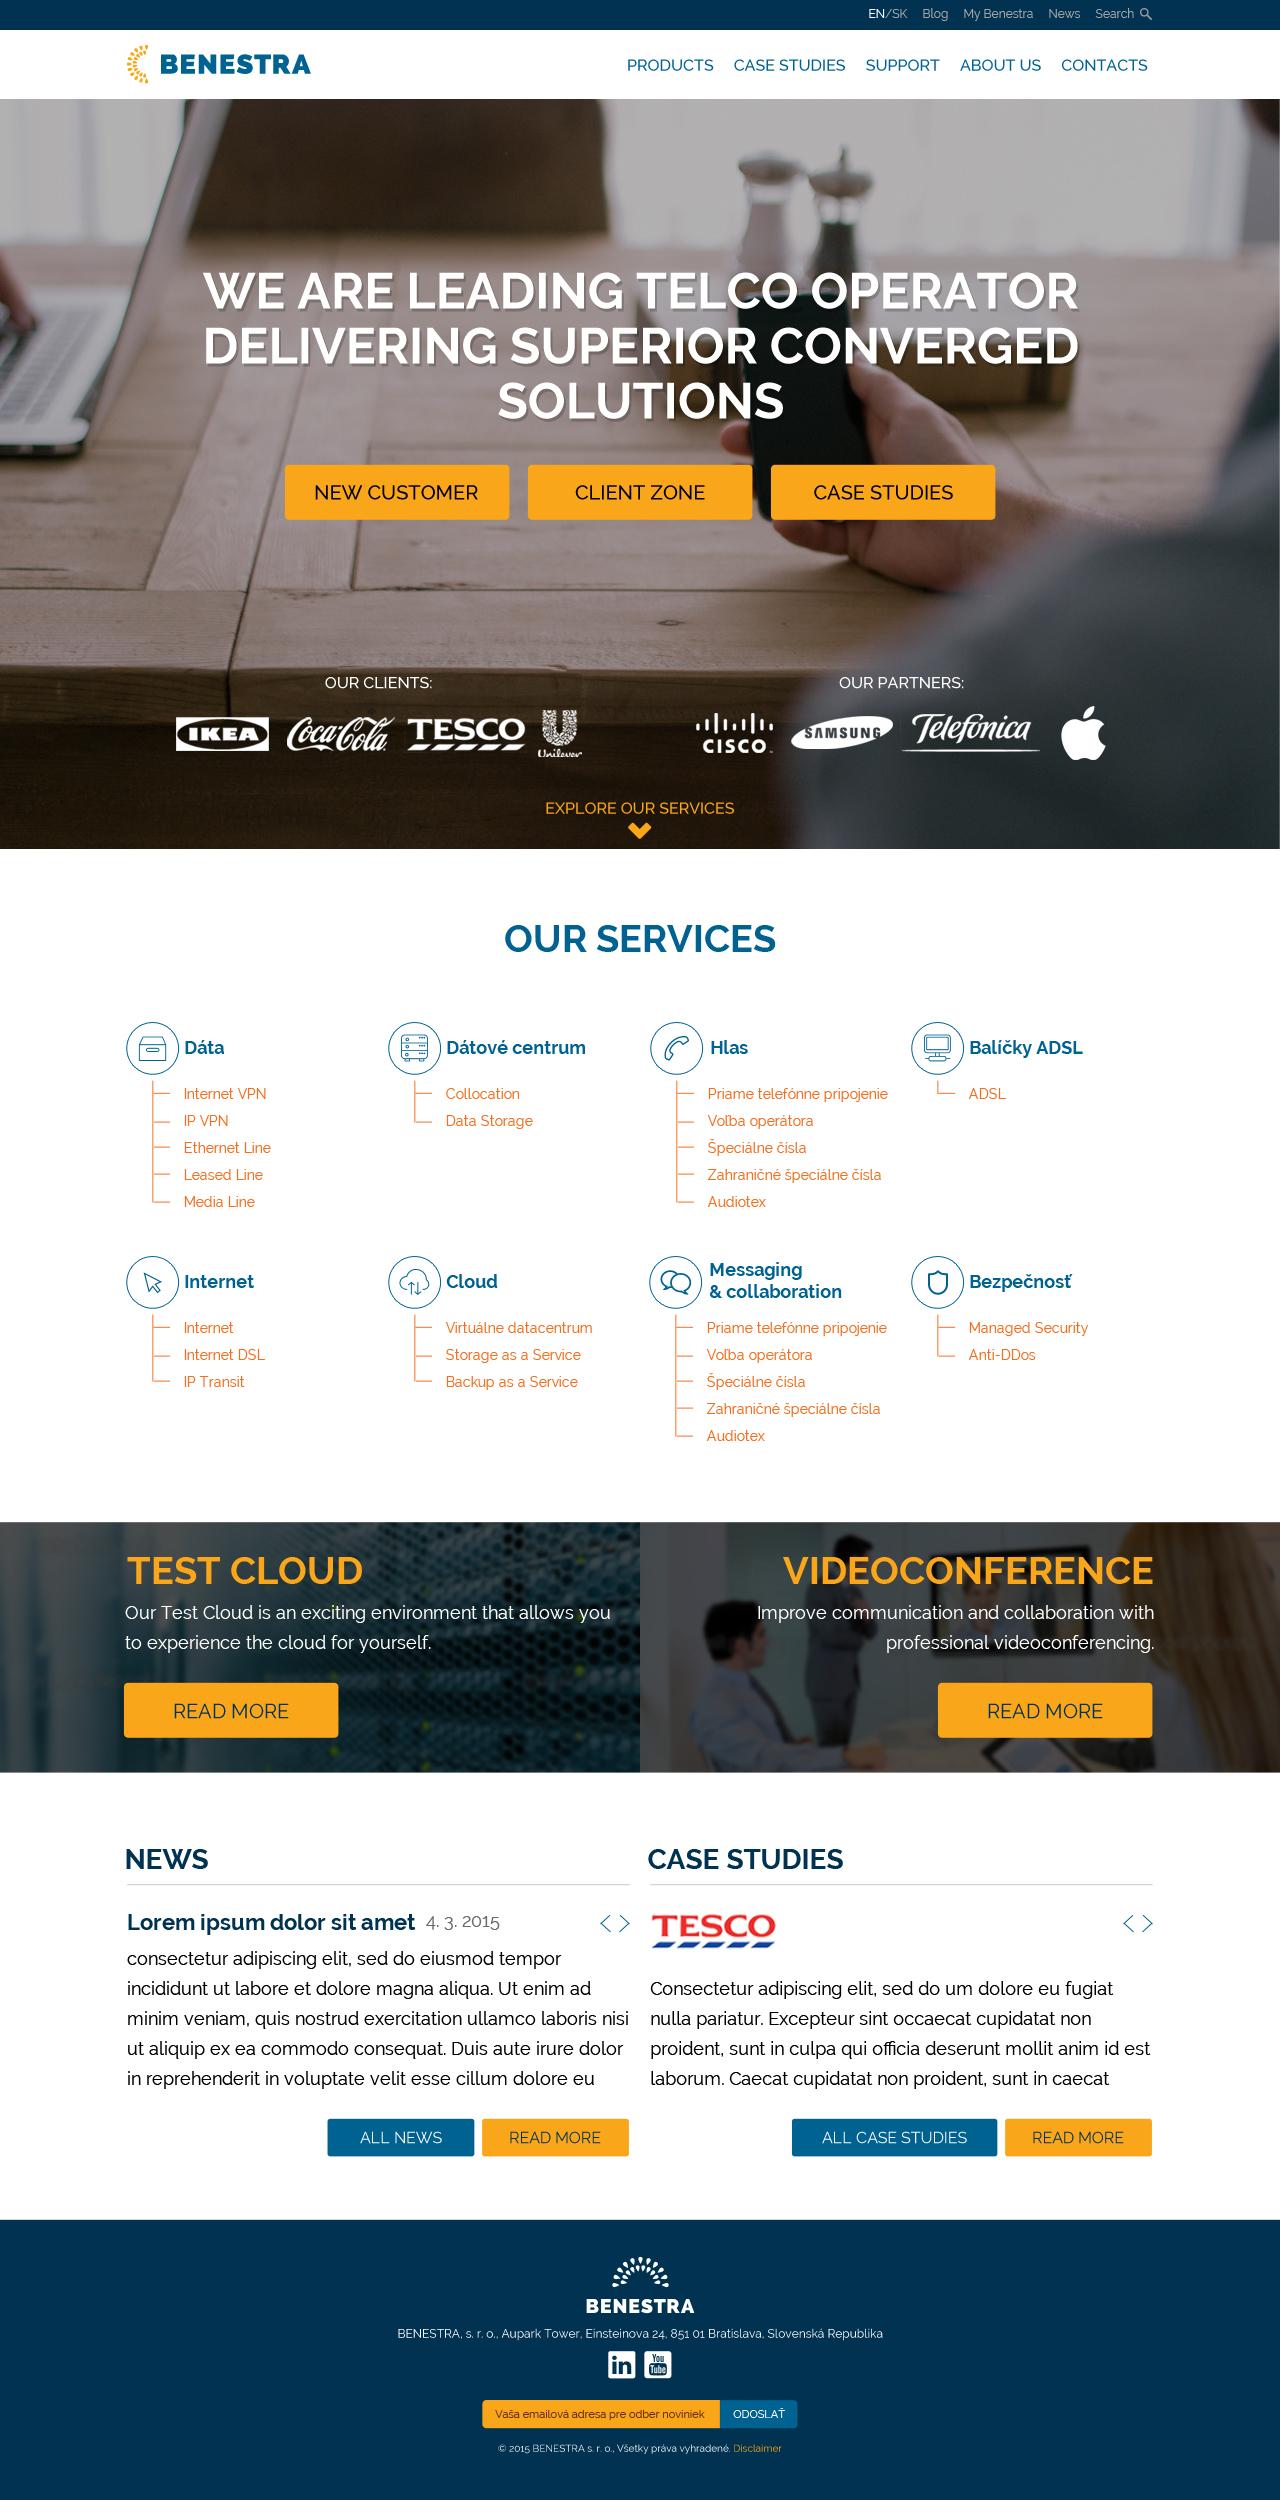 benestra_web_homepage_04